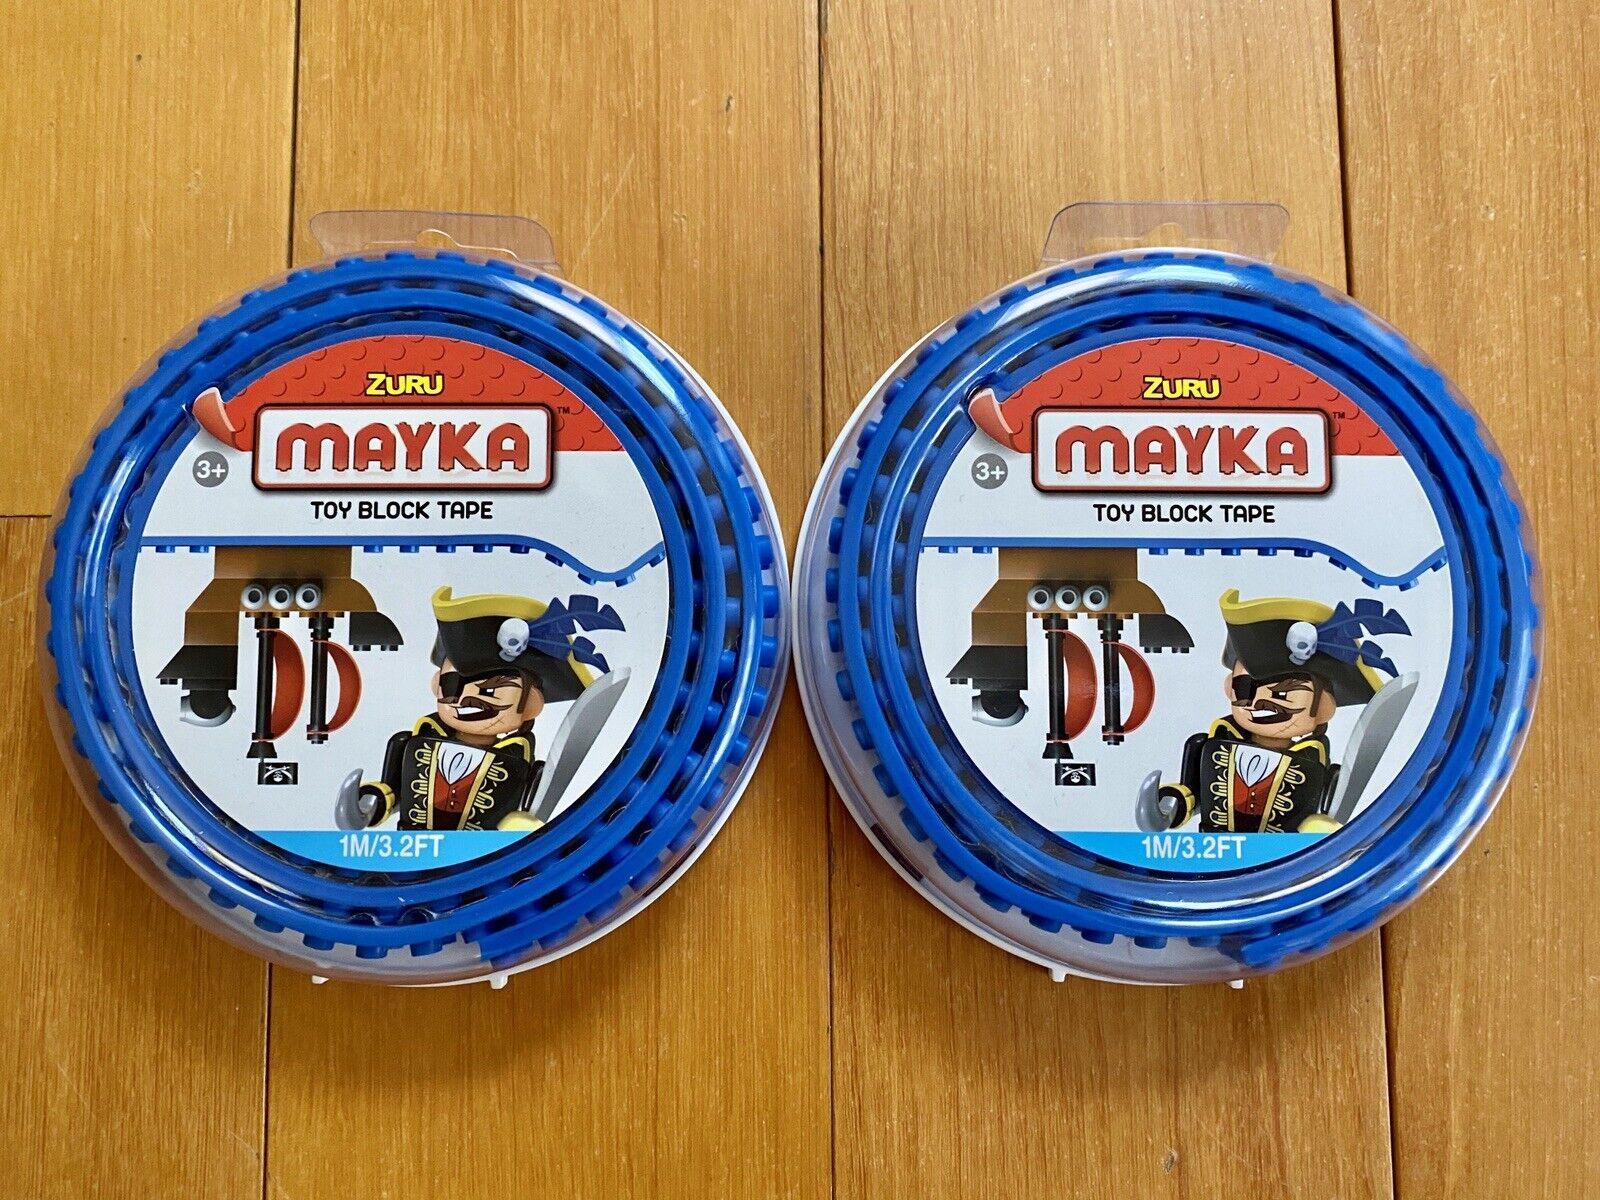 Dark Blue Zuru Mayka Tape 1M 3.2FT 2 Stud Toy building Block parts tape